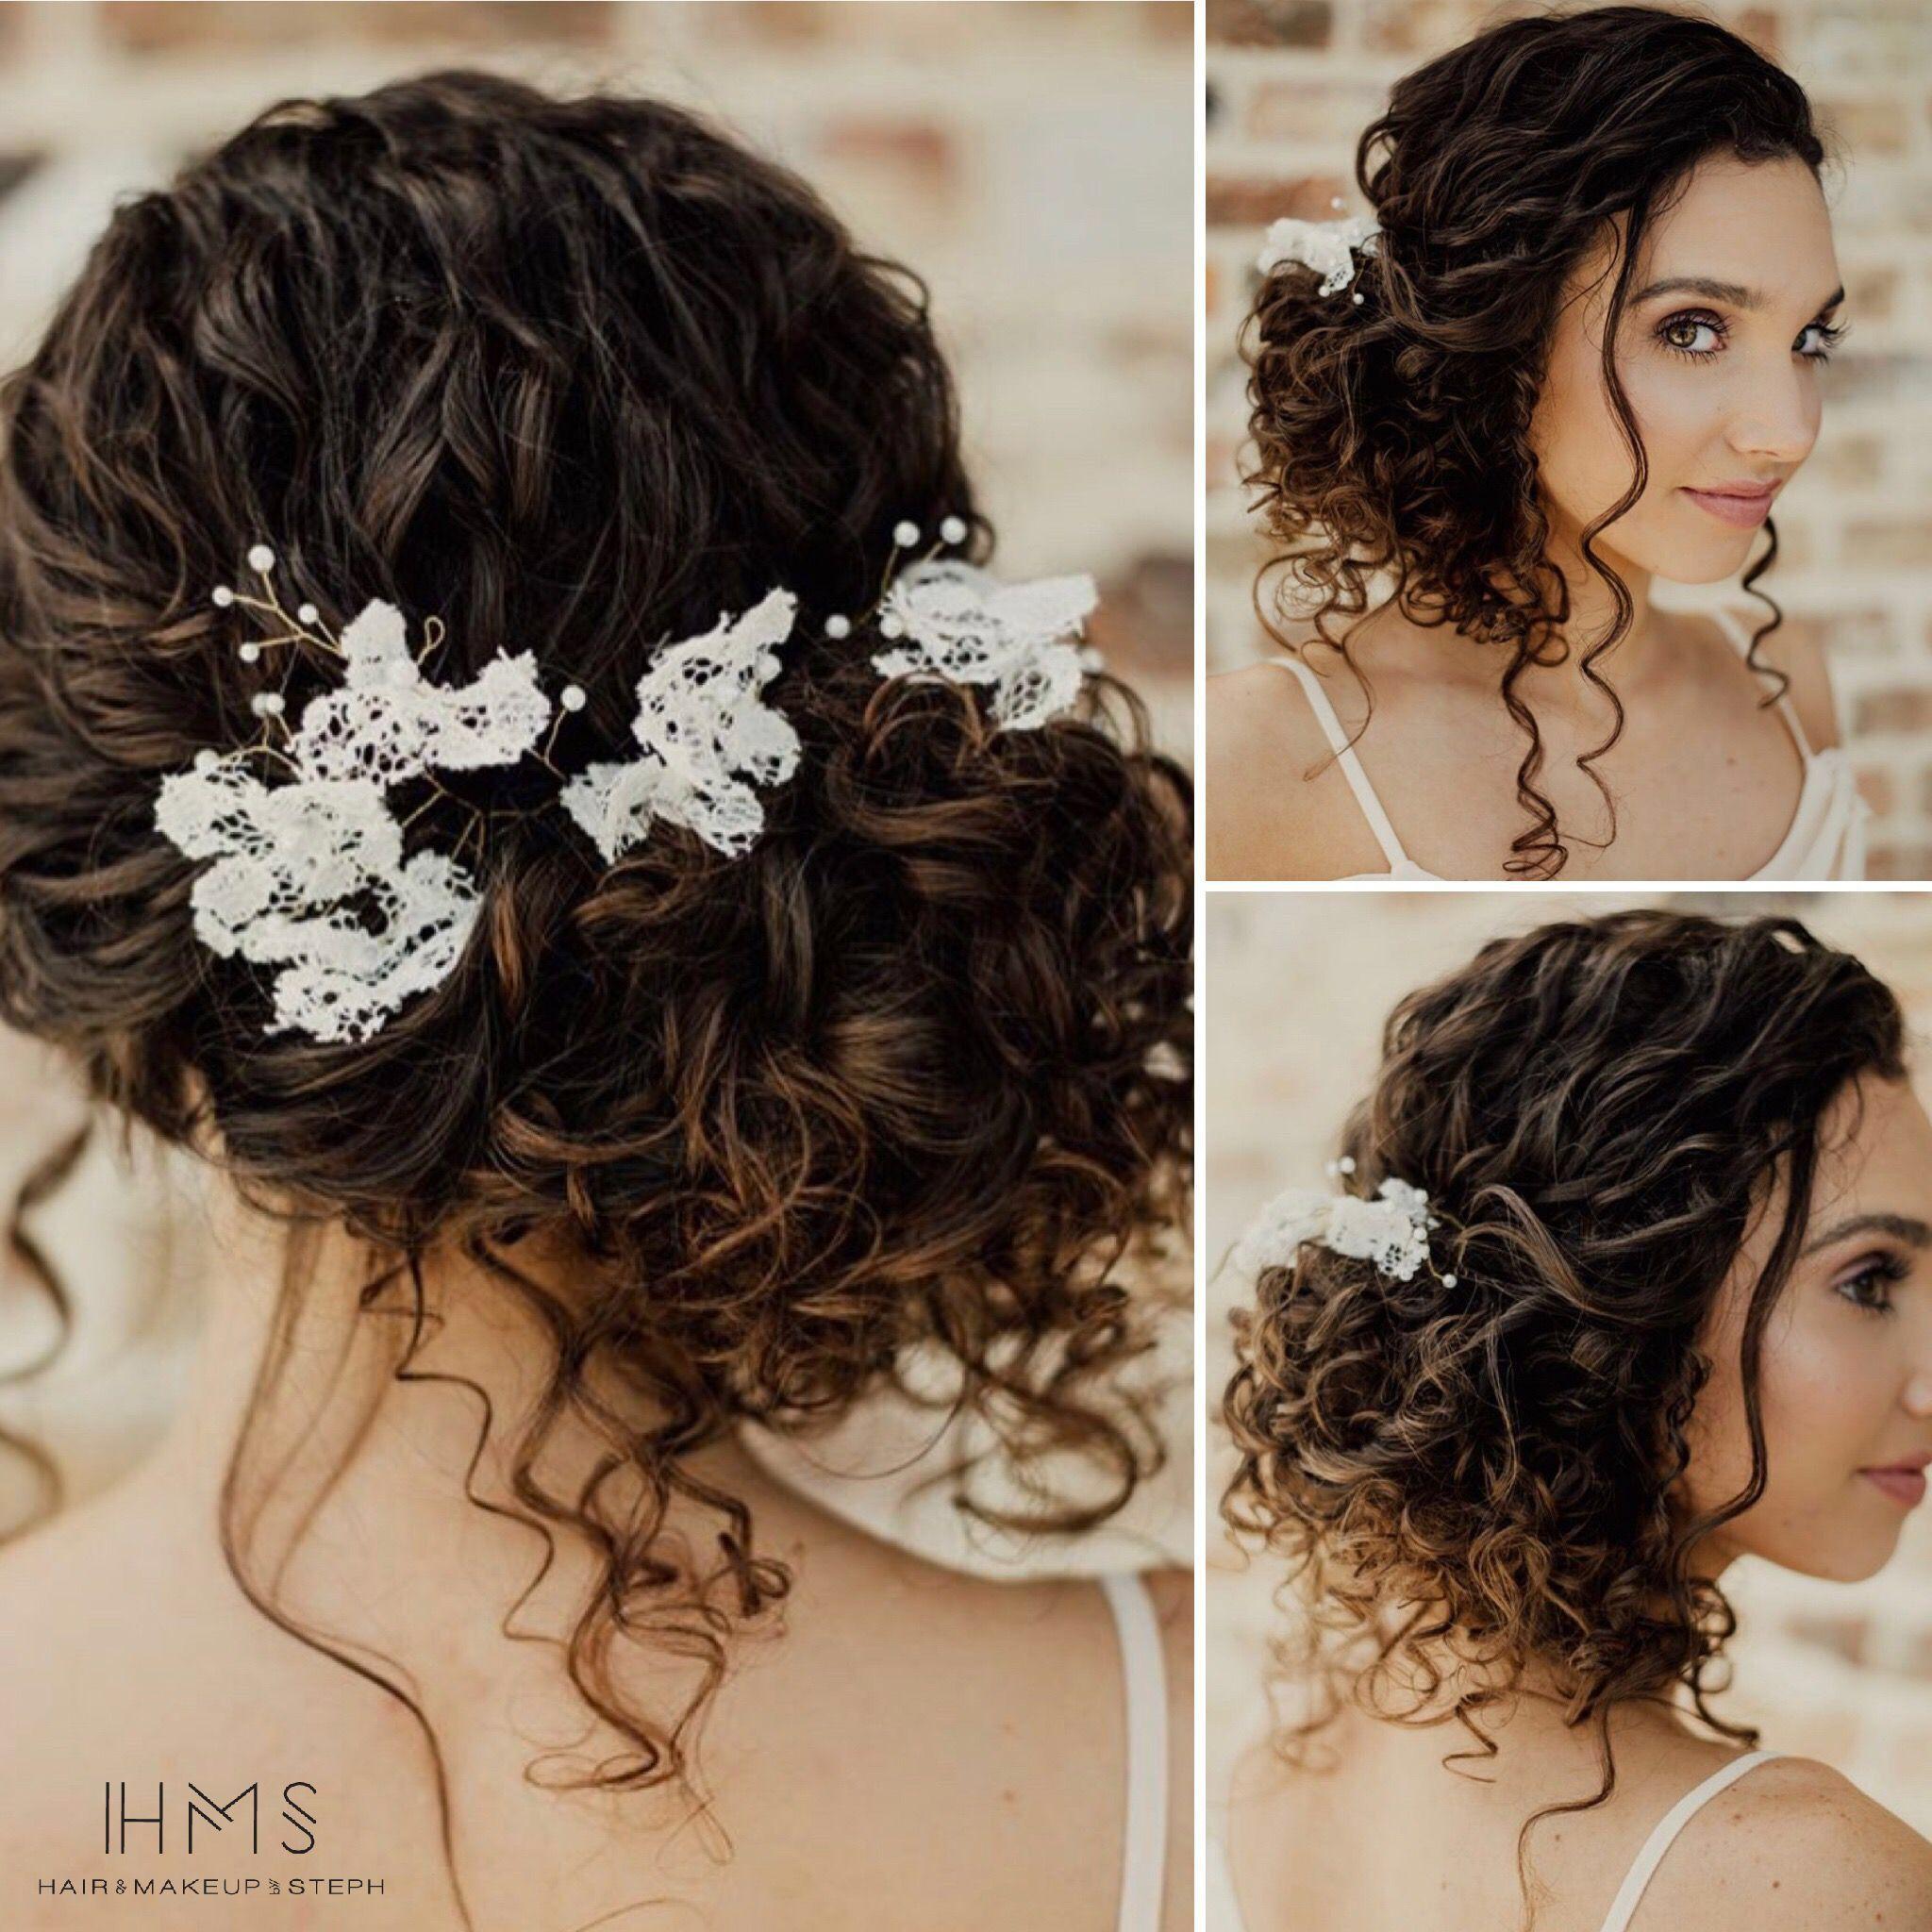 Naturally Curly Bridal Updo Curl Natural Bride Bridal Updo Wedding Hair Speci Curly Wedding Hair Curly Hair Styles Naturally Naturally Curly Hair Updo